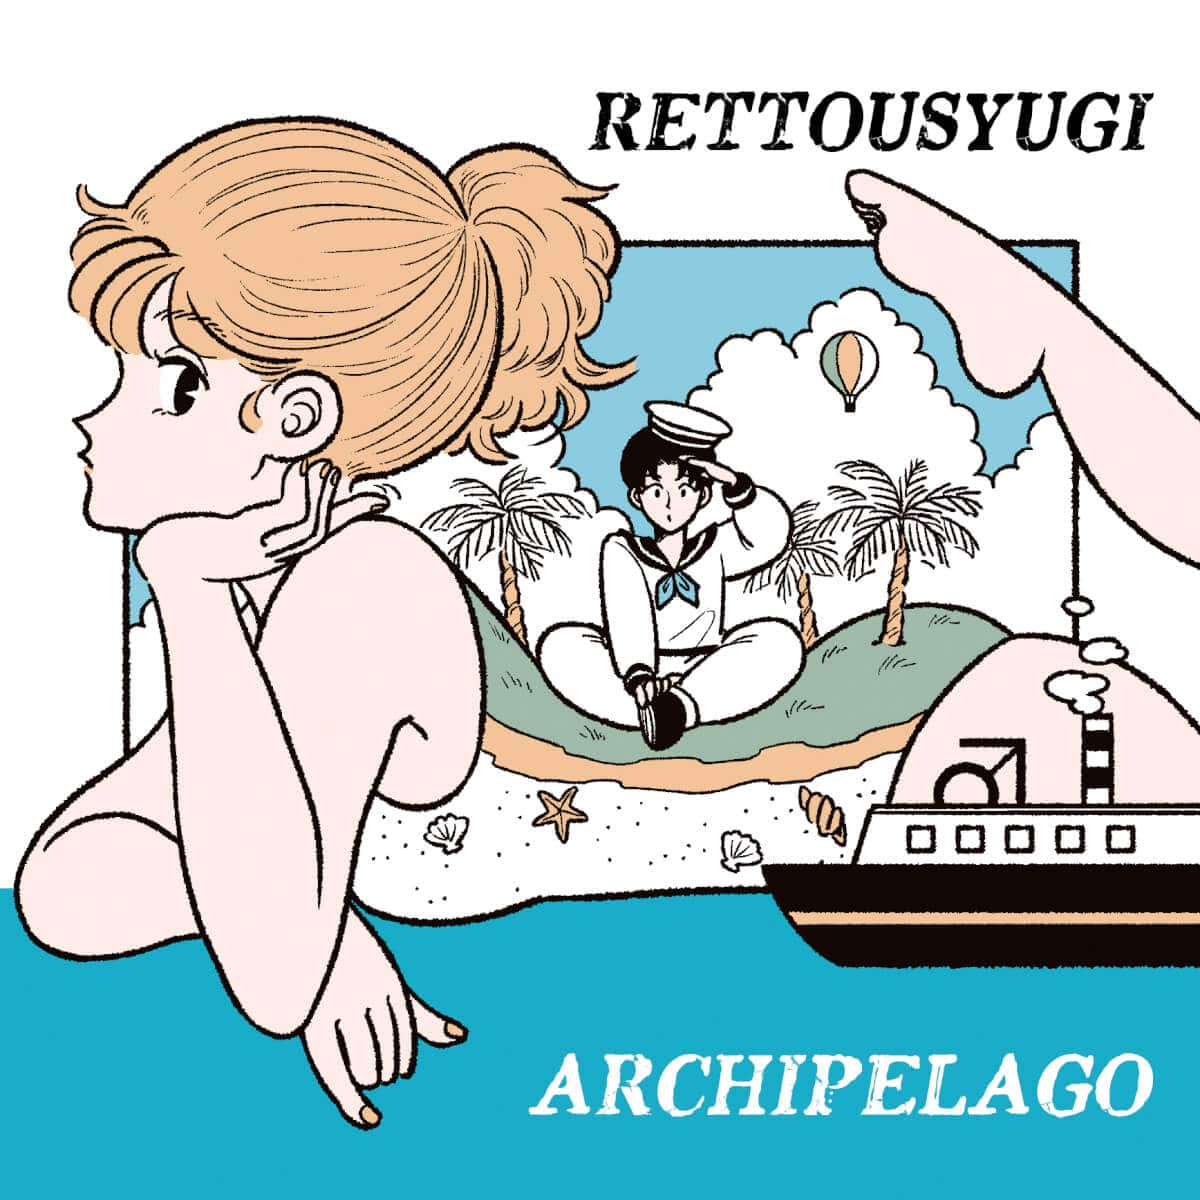 Archipelago – Rettousyugi